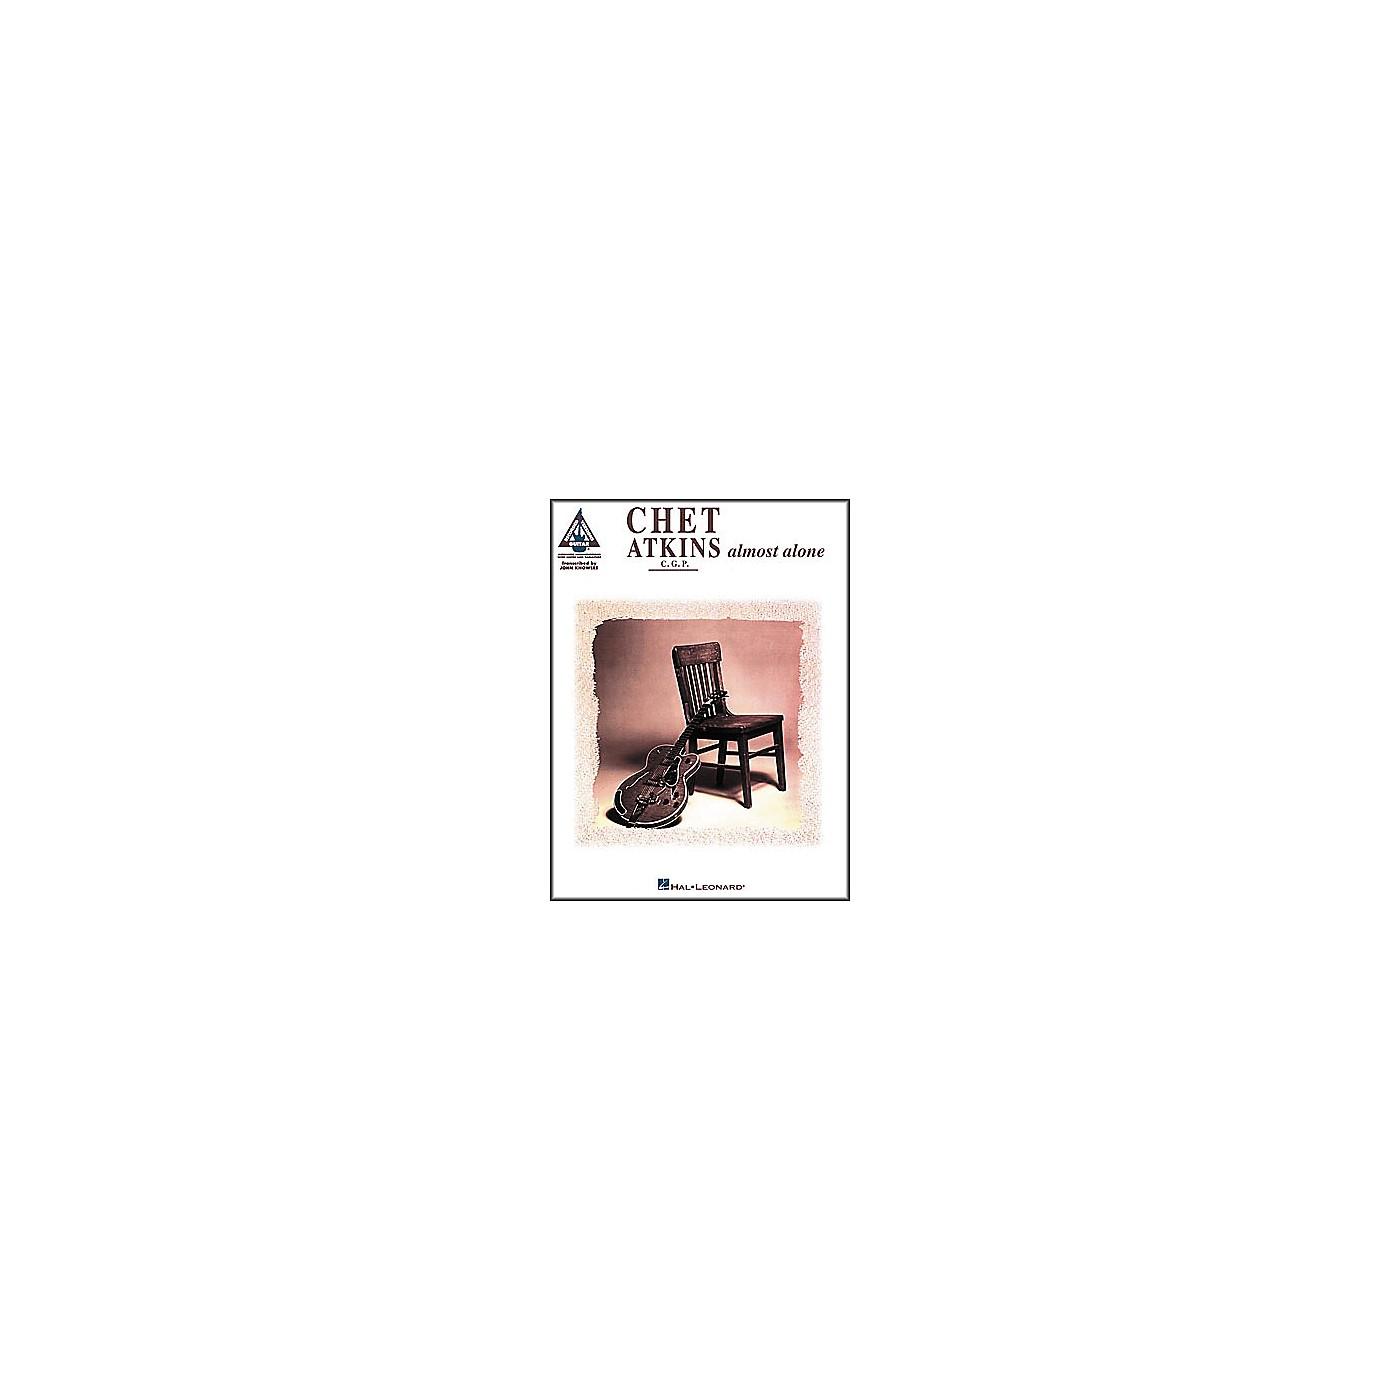 Hal Leonard Chet Atkins - Almost Alone Guitar Tab Book thumbnail